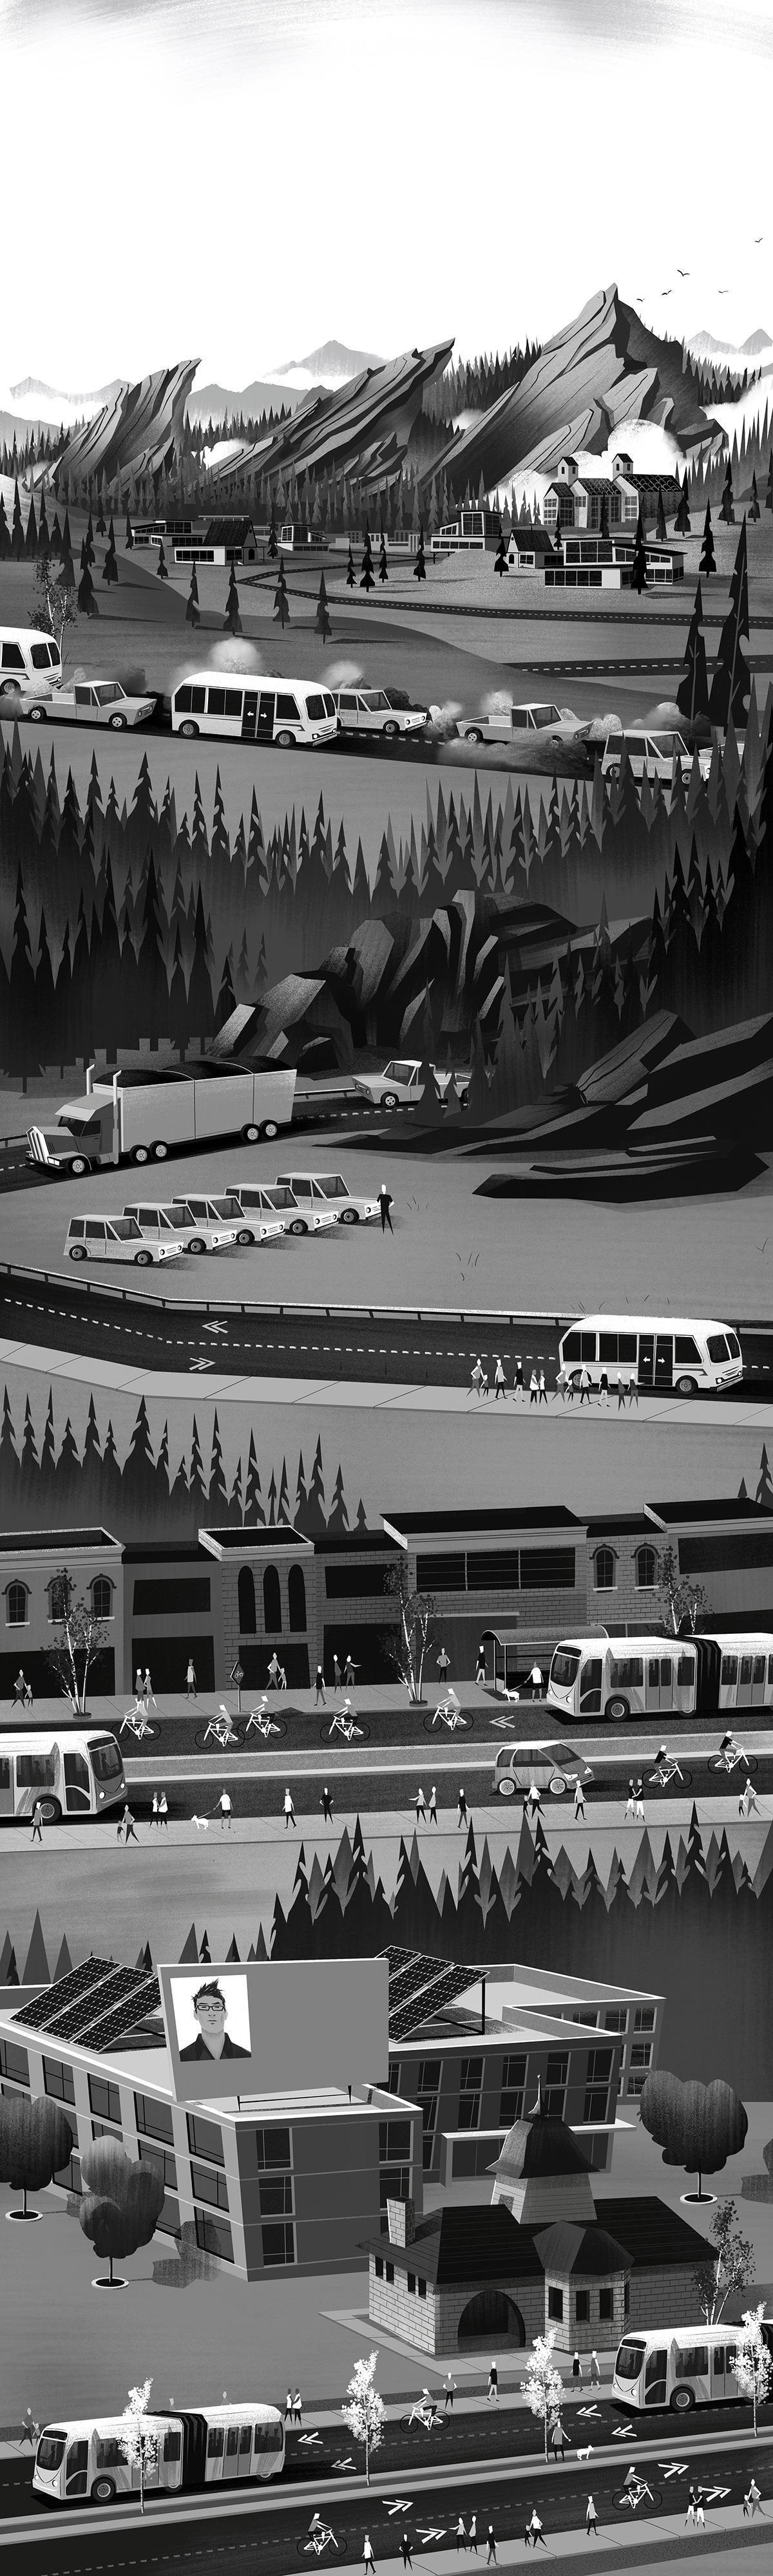 Black and White Polished Illustration